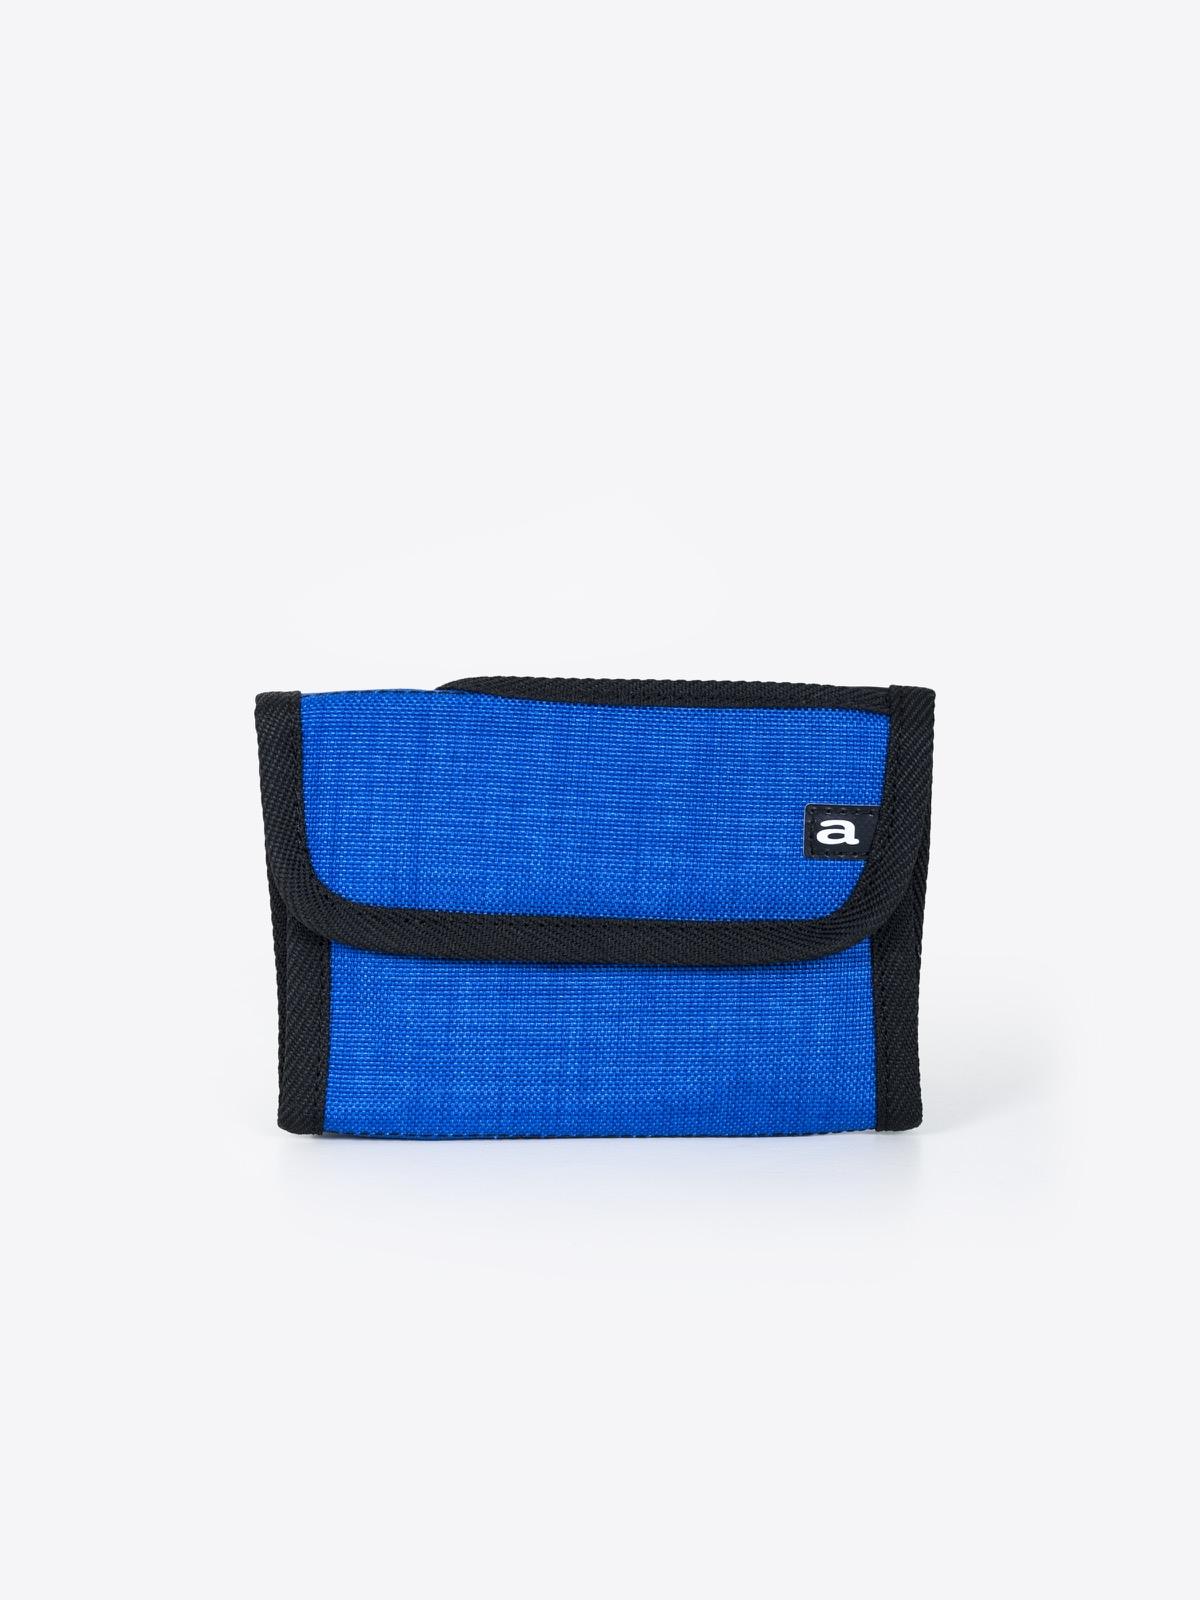 airbag craftworks palermo   nylon blue